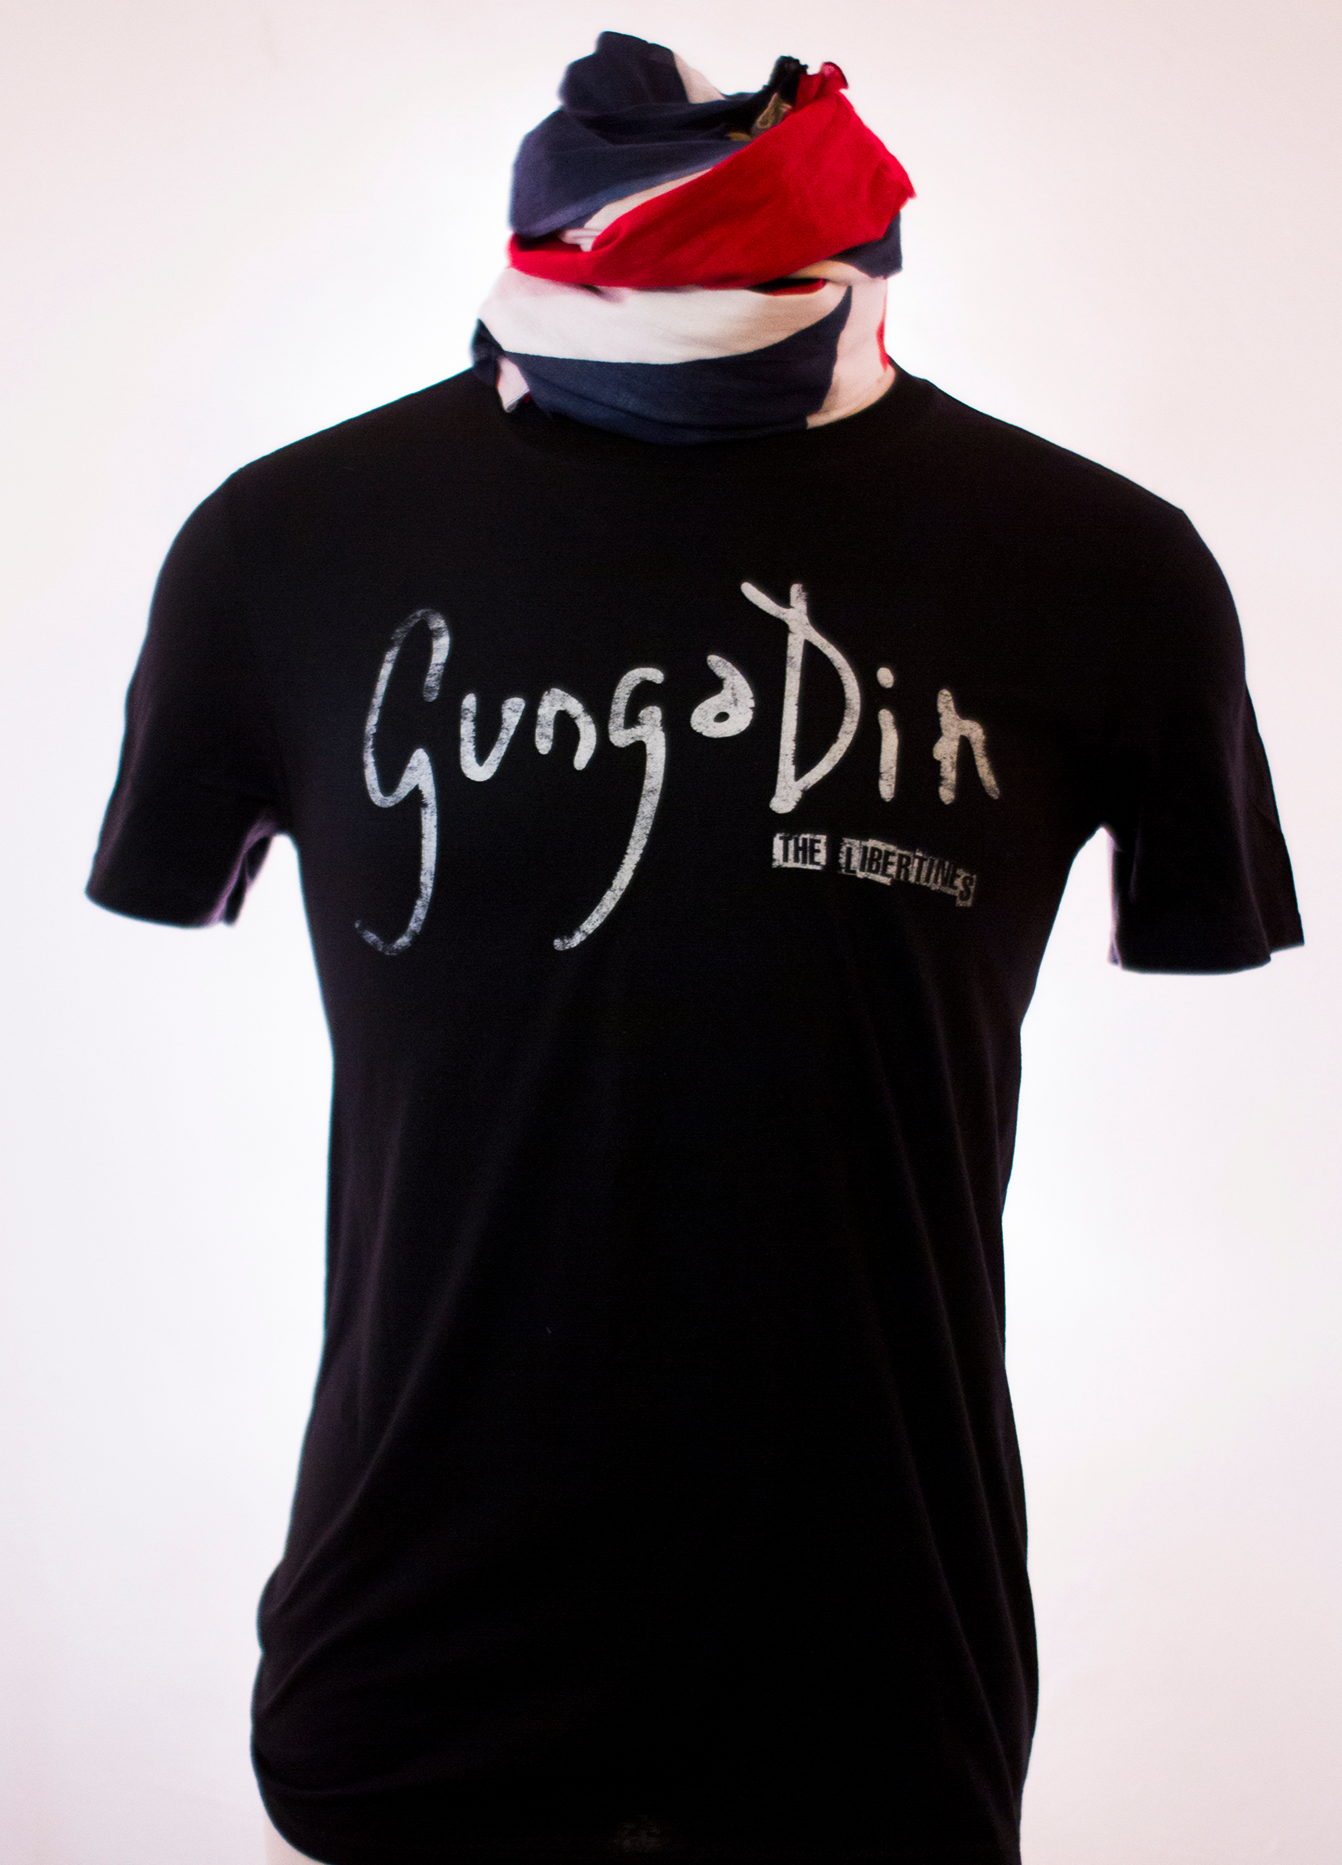 Gunga Din T-Shirt (SALE) - The Libertines